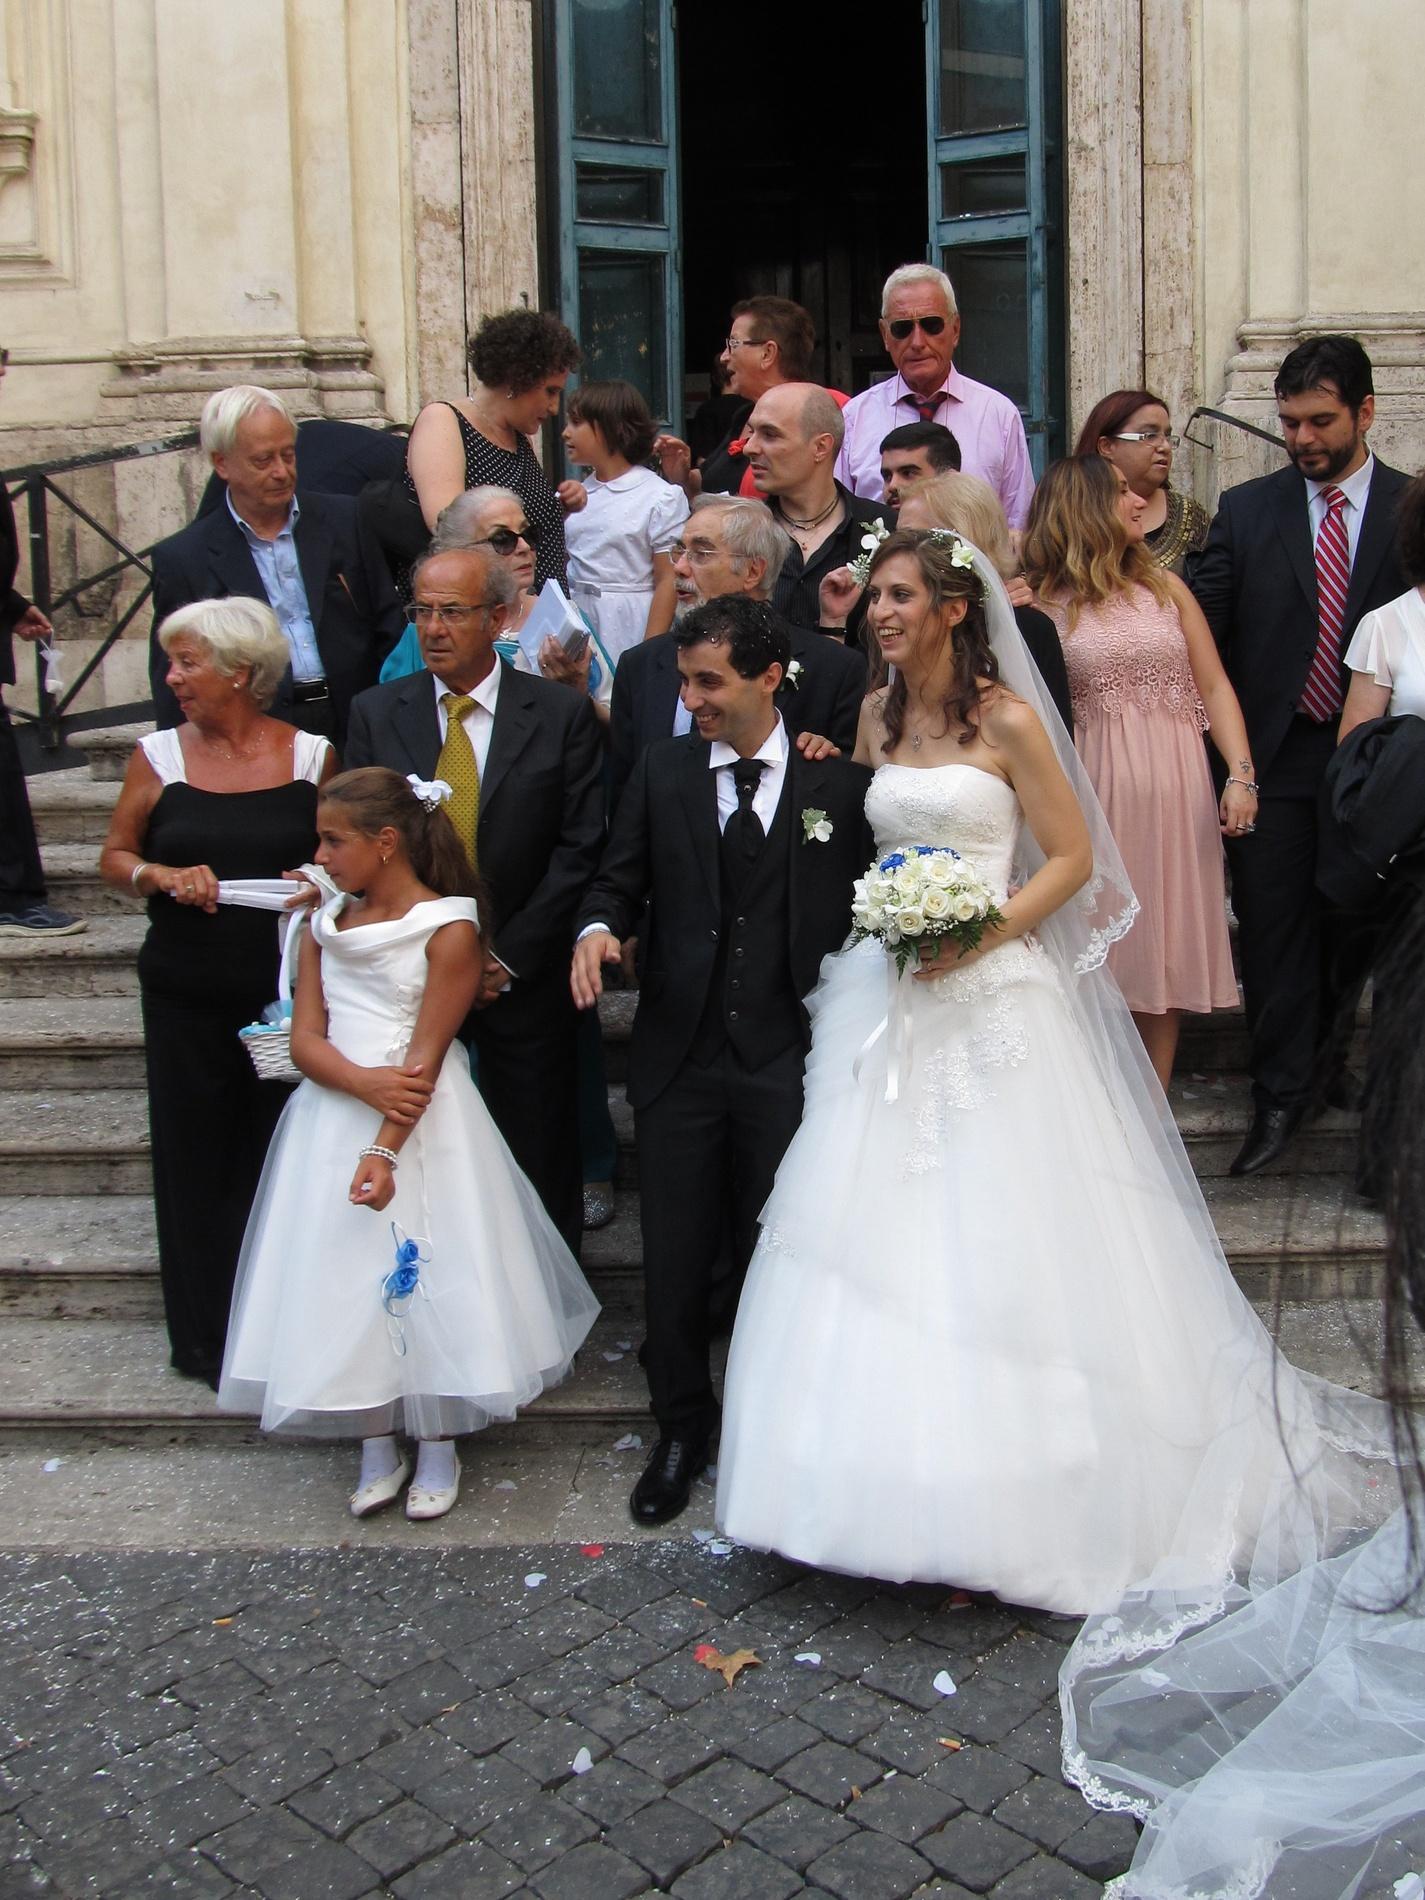 matrimonio-ilaria-torrisi-e-marco-di-lucia-2015-08-08-16-56-05